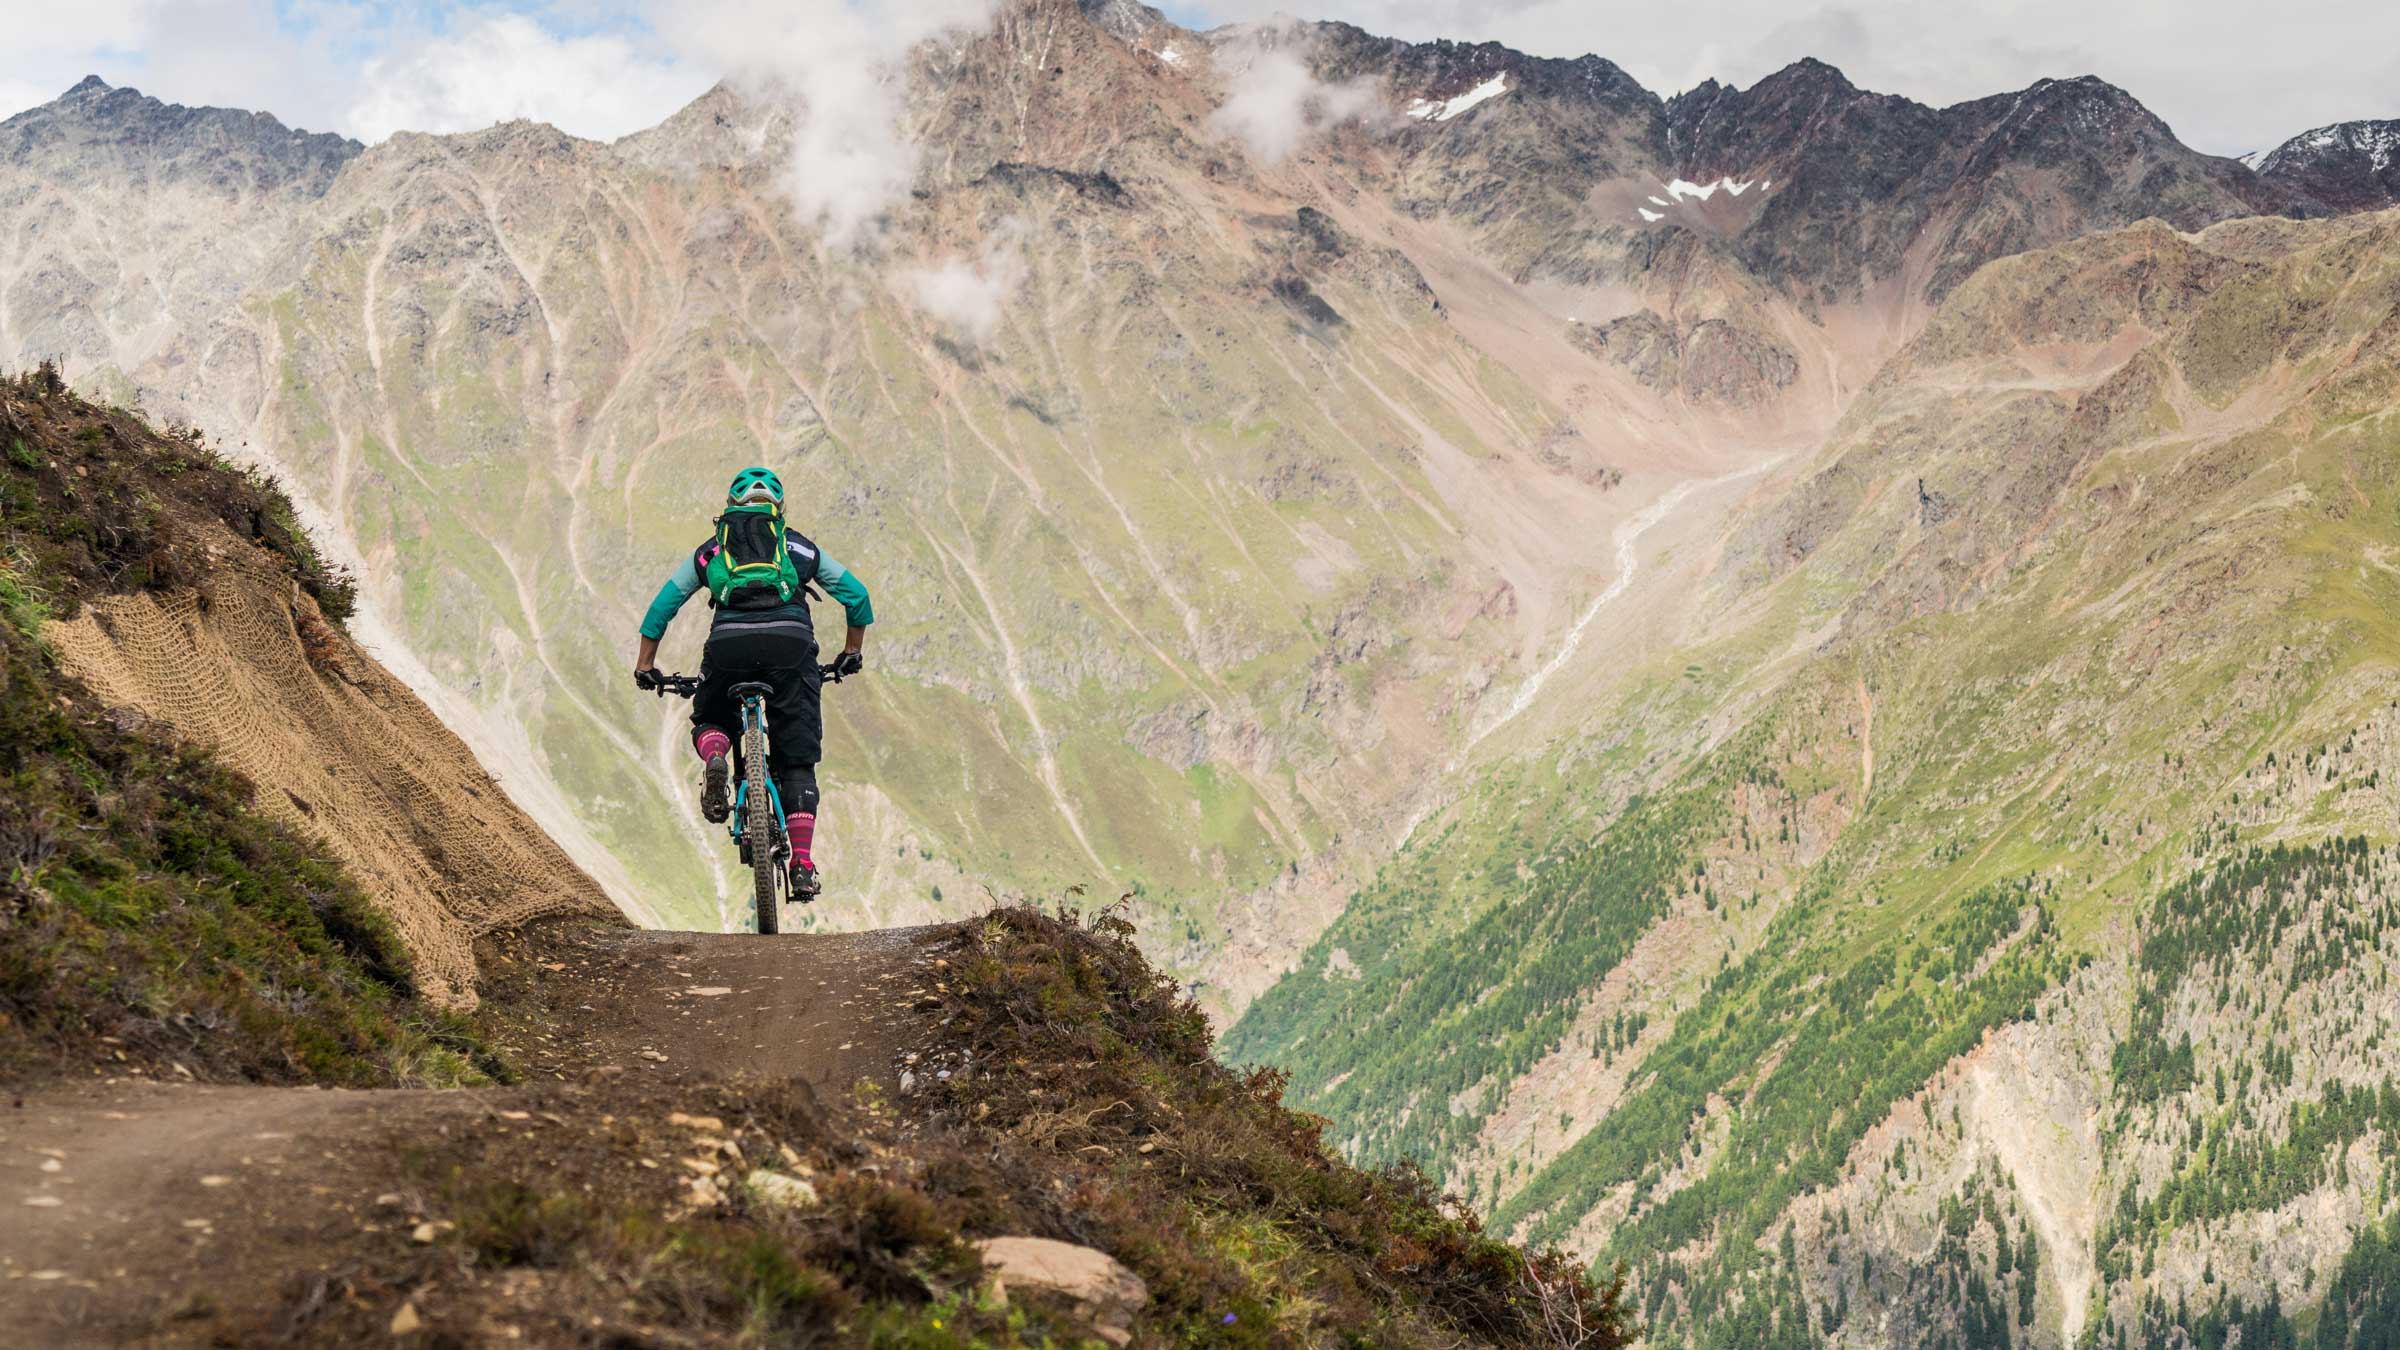 Leitfaden für Flowtrail Abenteurer in der Bike Republic Sölden